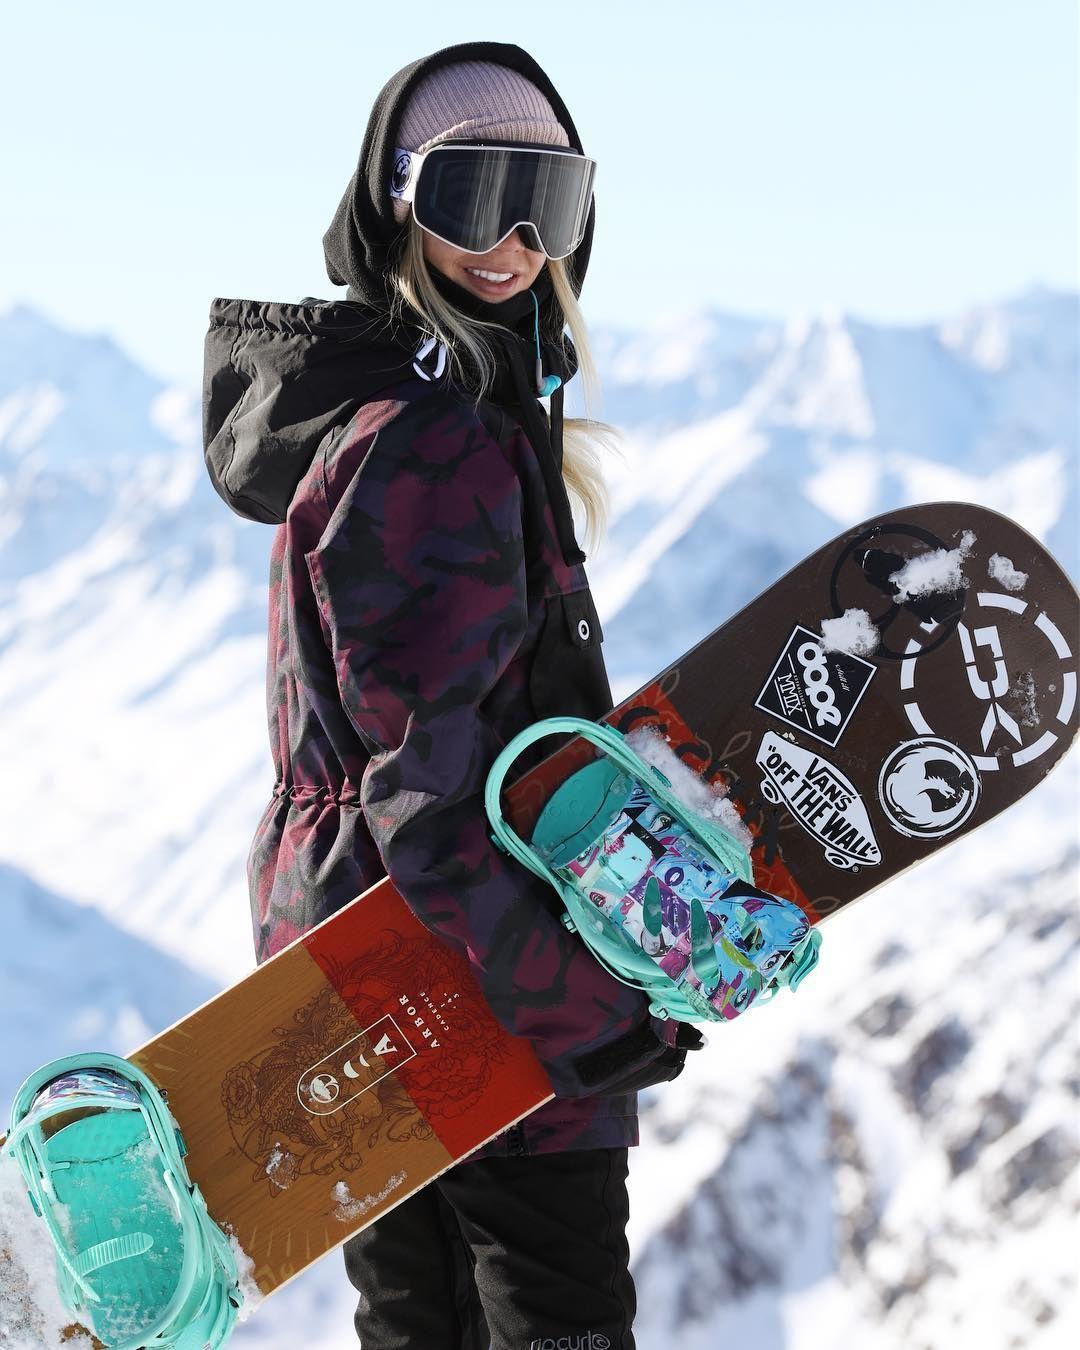 куда фото сноуборд с чемоданом могу